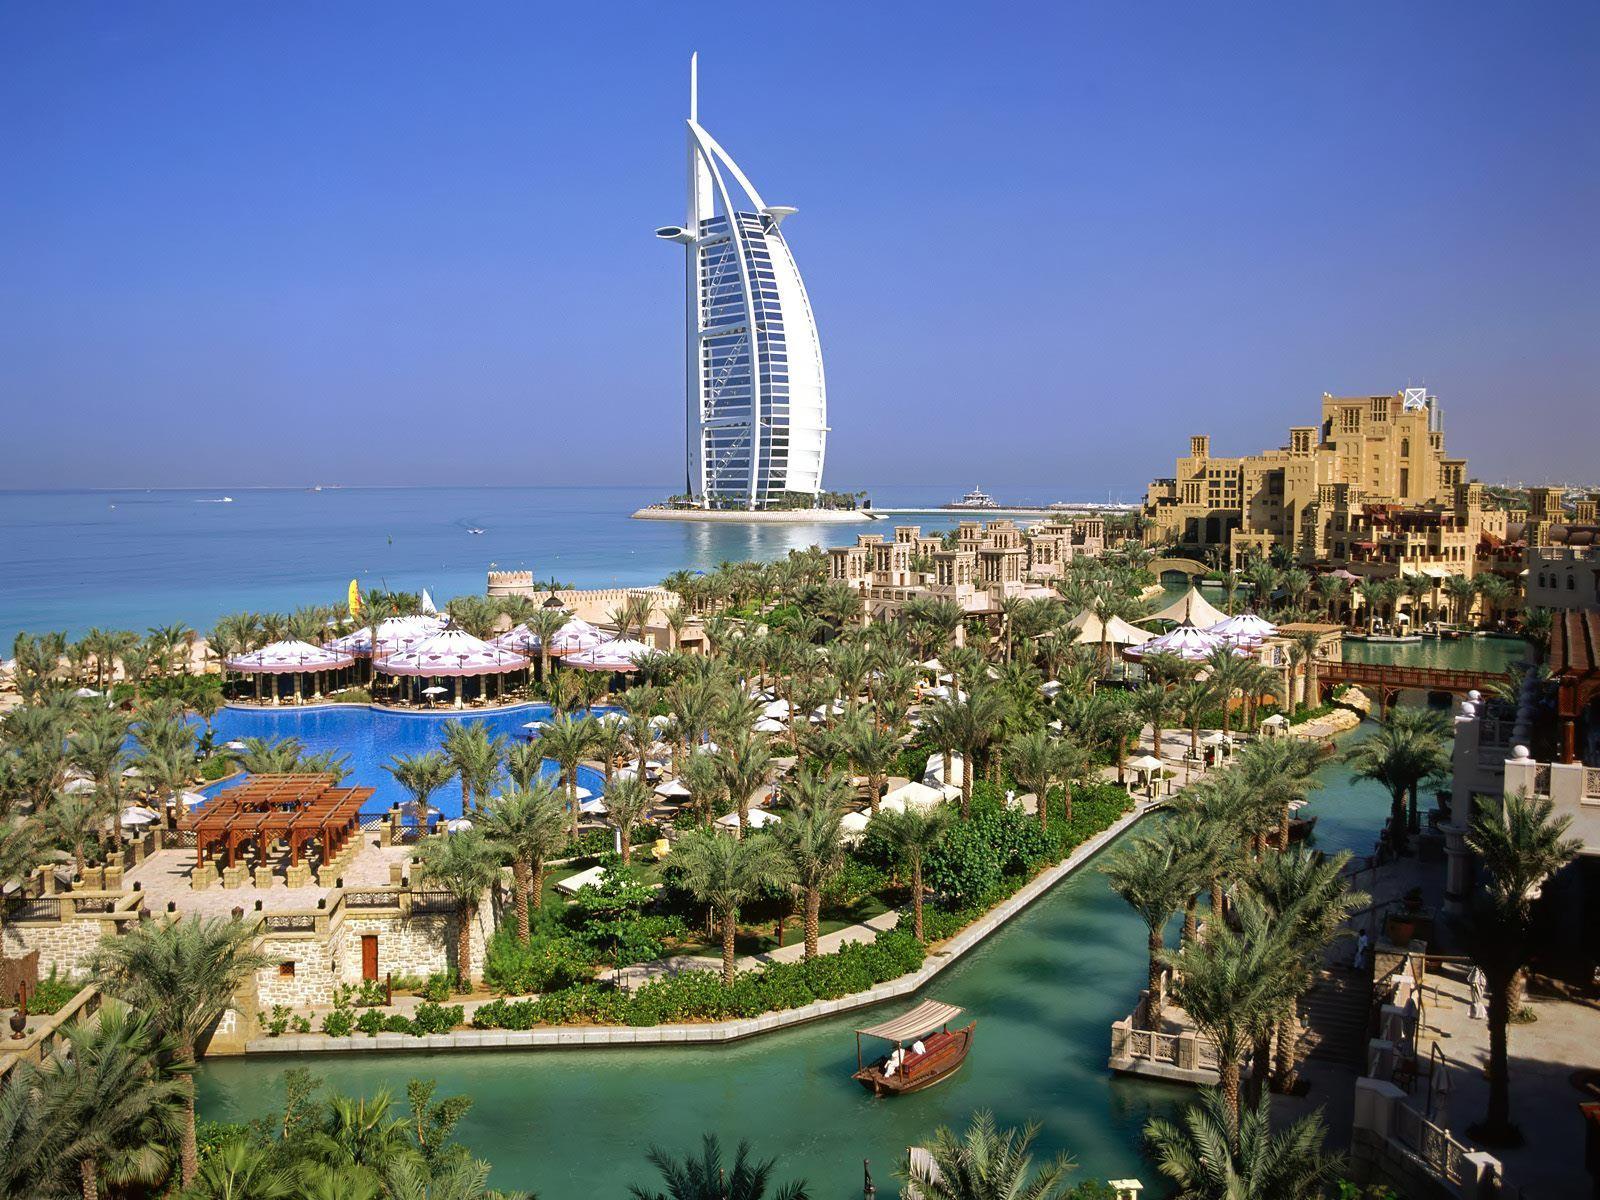 http://1.bp.blogspot.com/-M_MwSLyJ-ZM/TxLlKonMlII/AAAAAAAAAf0/MVHaisb5D9A/s1600/burj_al_arab_hotel_dubai-normal.jpg